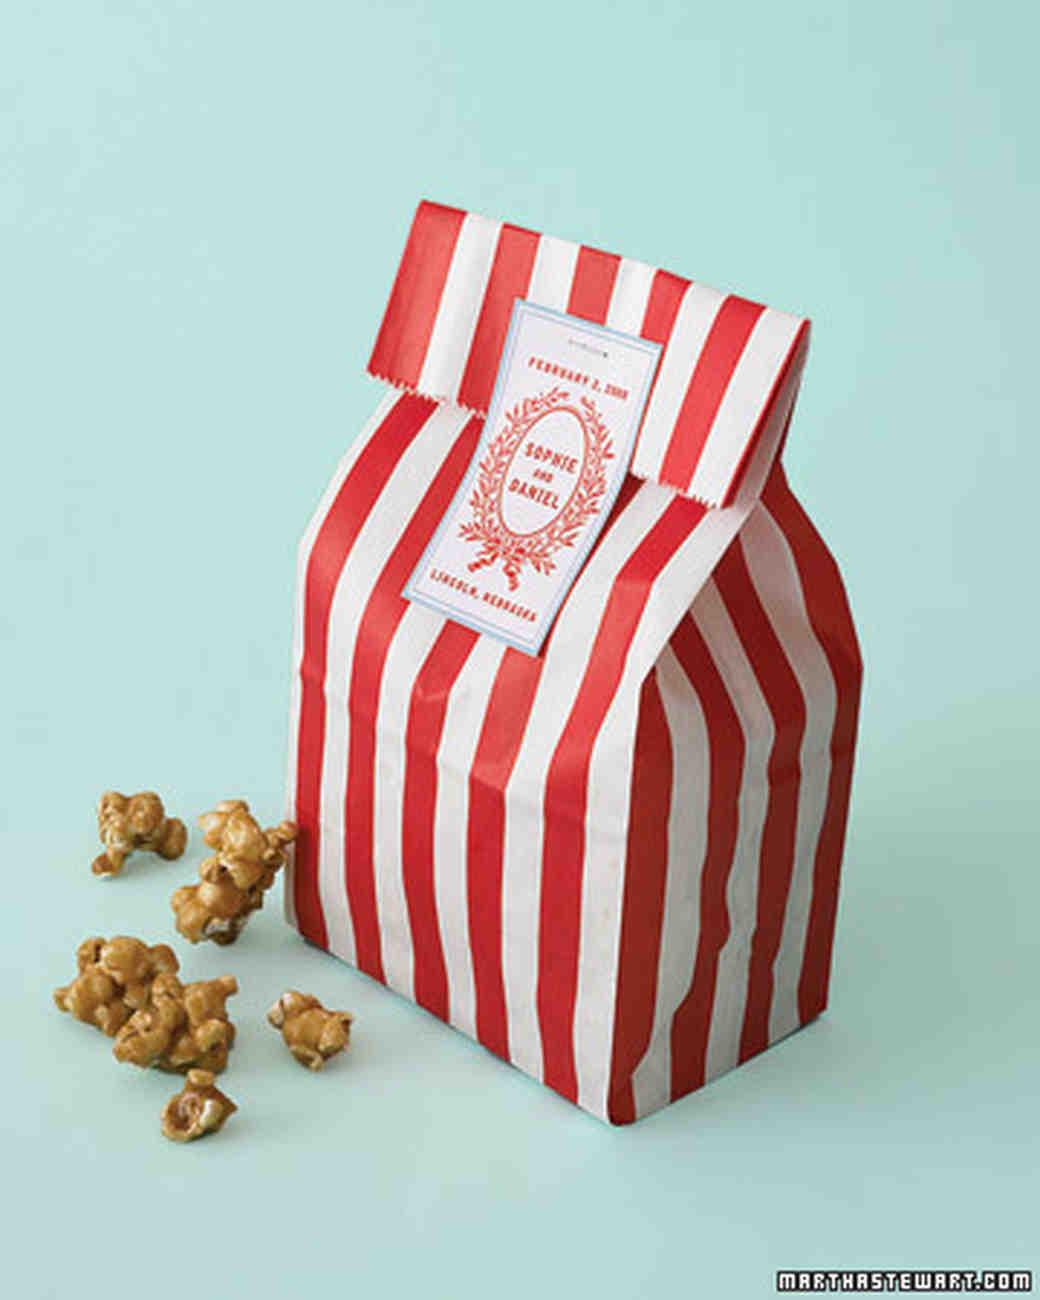 Caramel and Fleur de Sel Popcorn